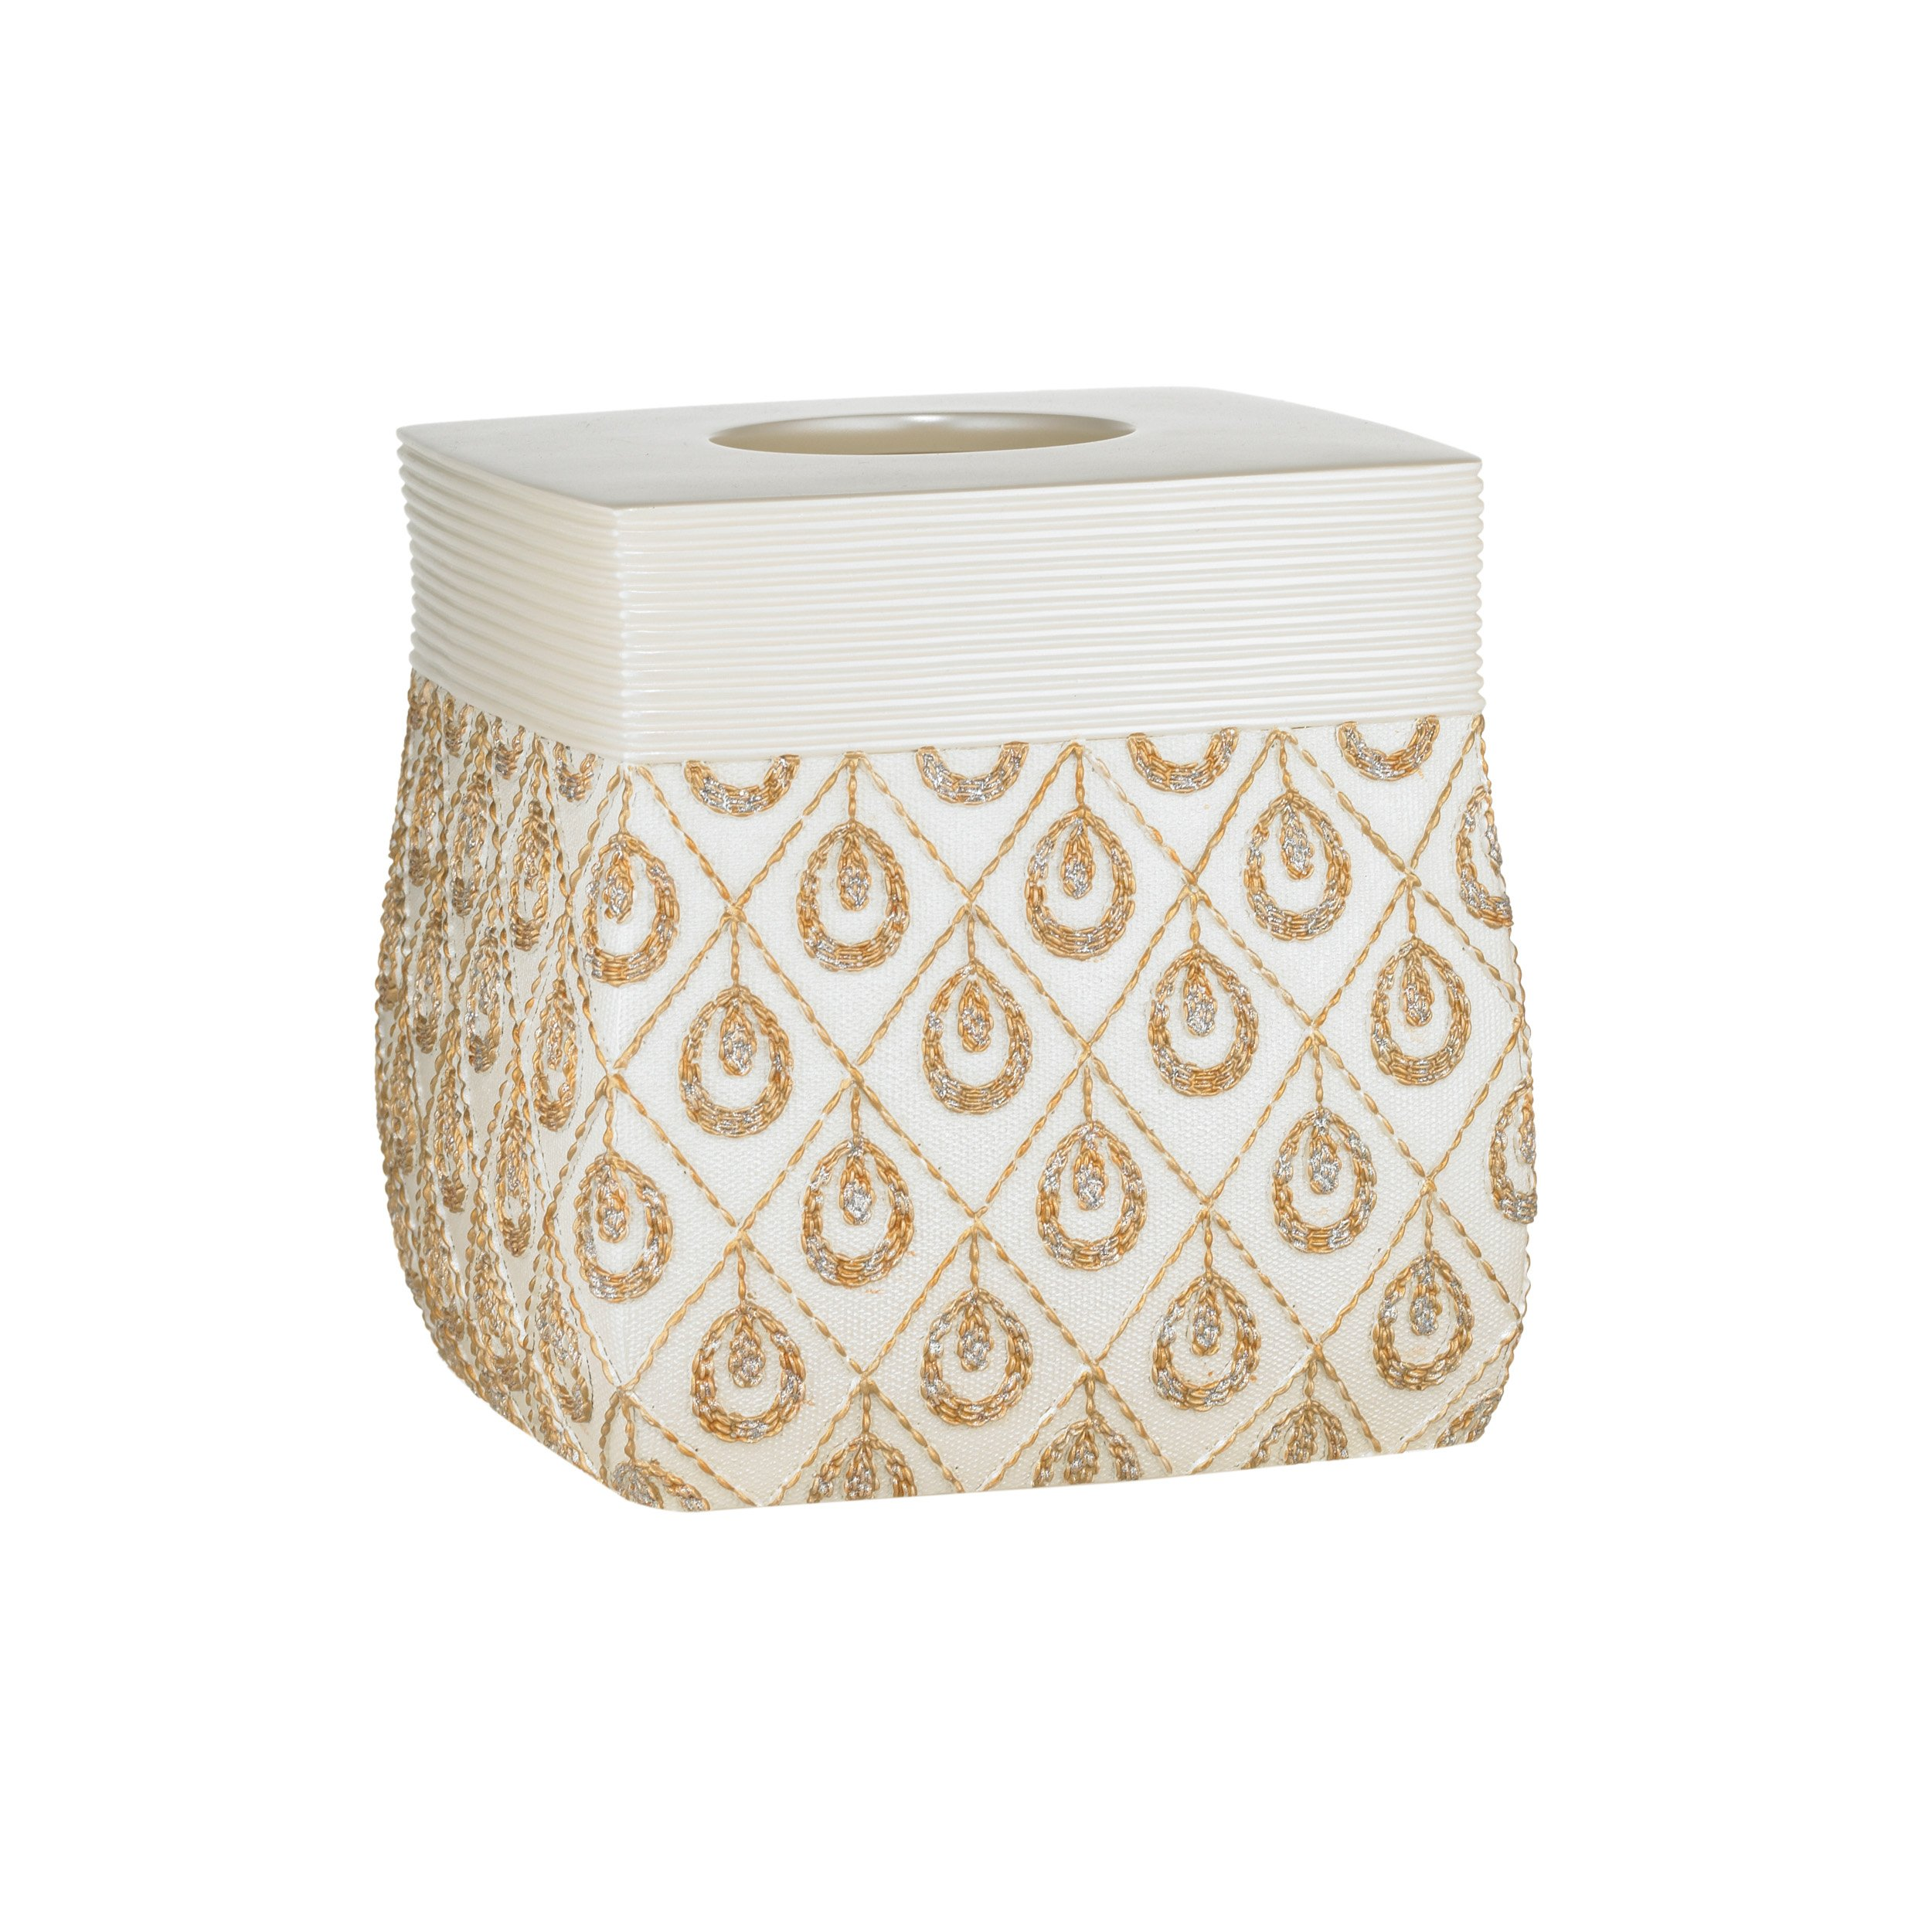 Popular Bath 843958 Seraphina Tissue Box,Ivory by Popular Bath (Image #1)